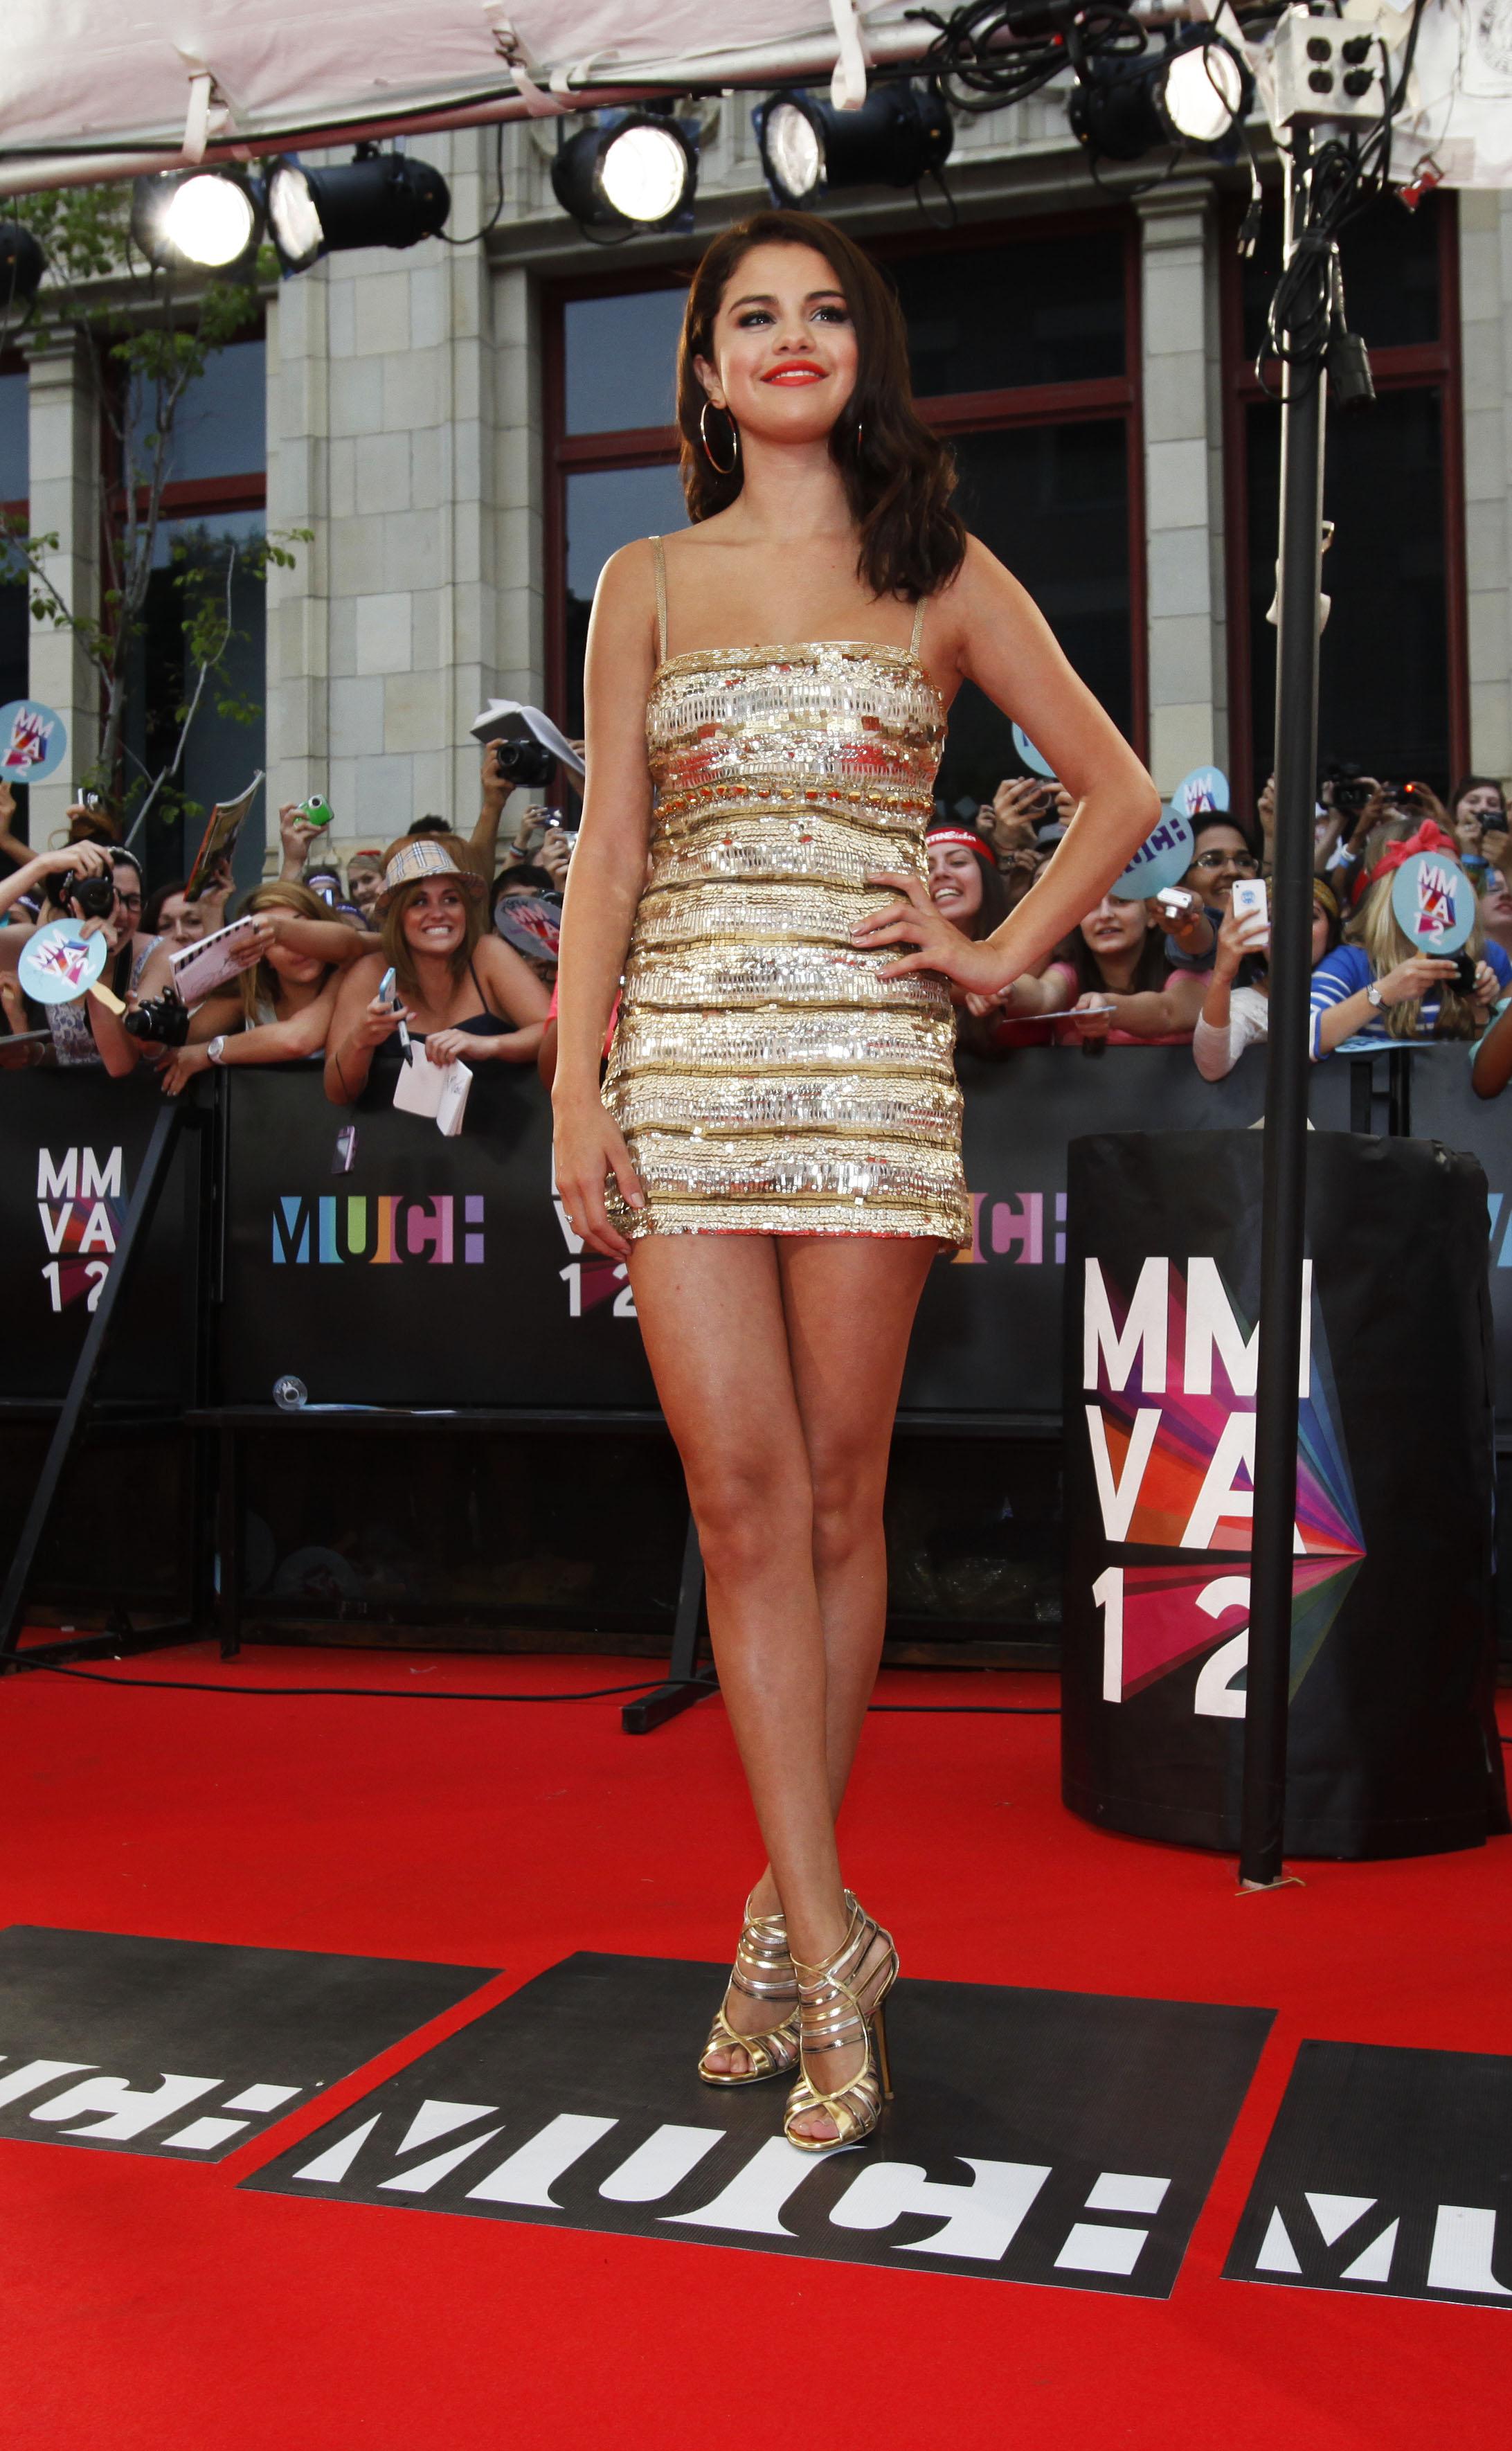 Selena Gomez on MMVA 2012 Red Carpet, photo MuchMusic